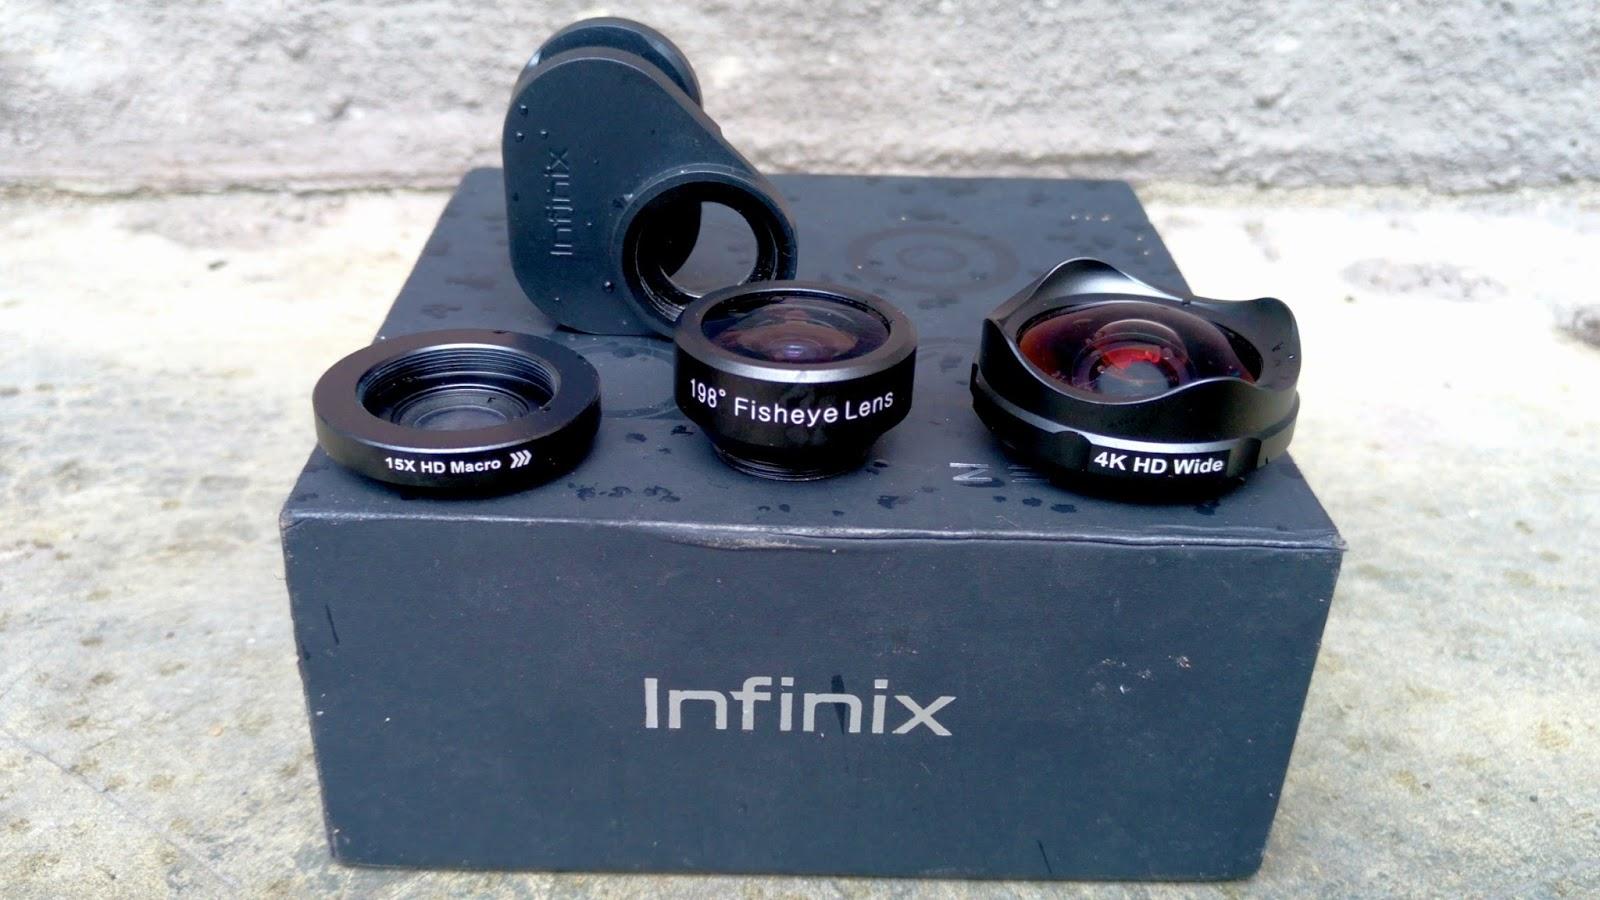 The Infinix X-Lens Mobile Lens Kit